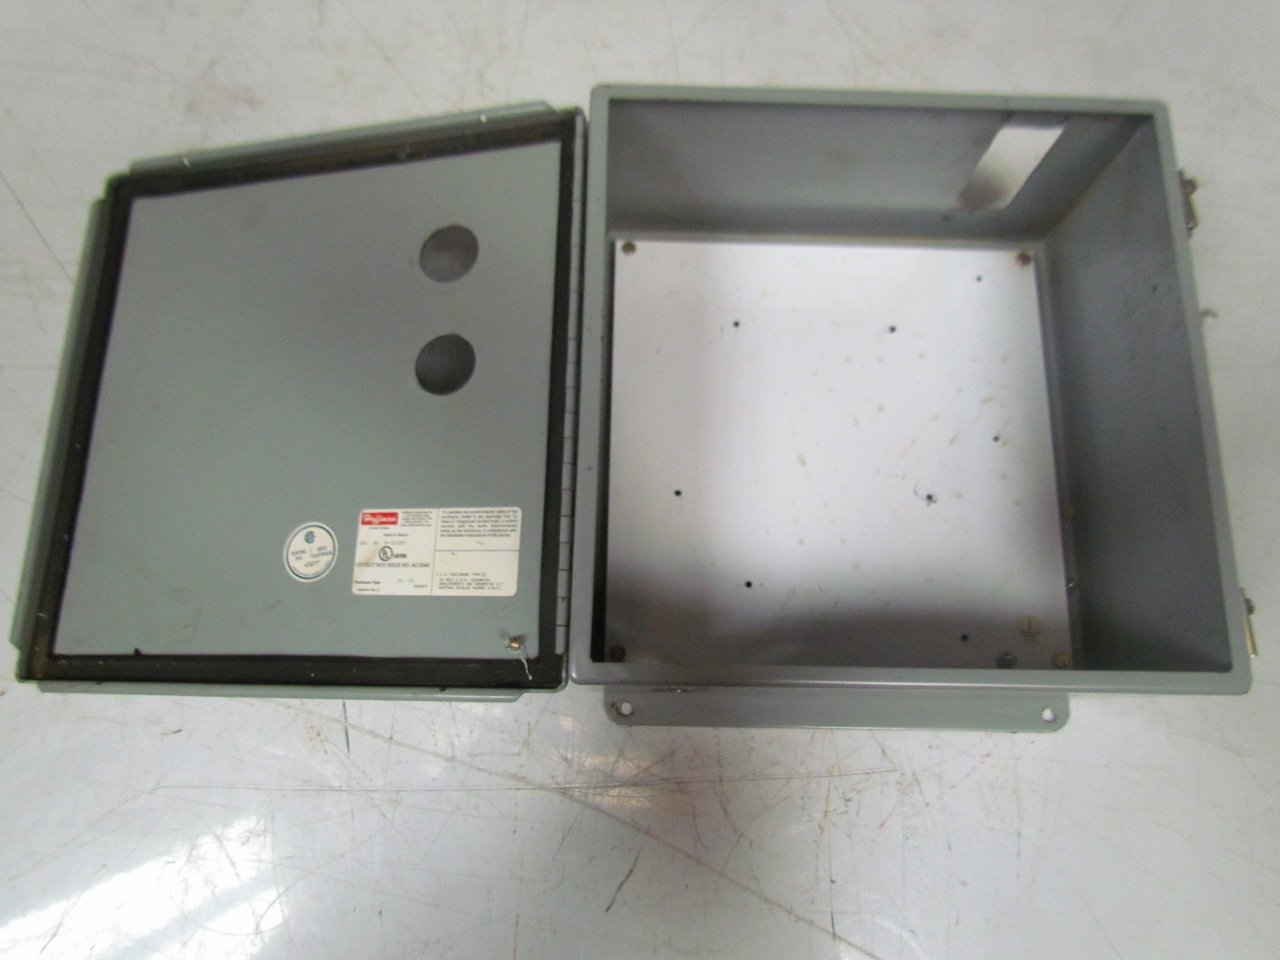 "Box Cut Outs Beautiful Hoffman A 1212ch Electrical Enclosure Cut Out Box 12""x12"